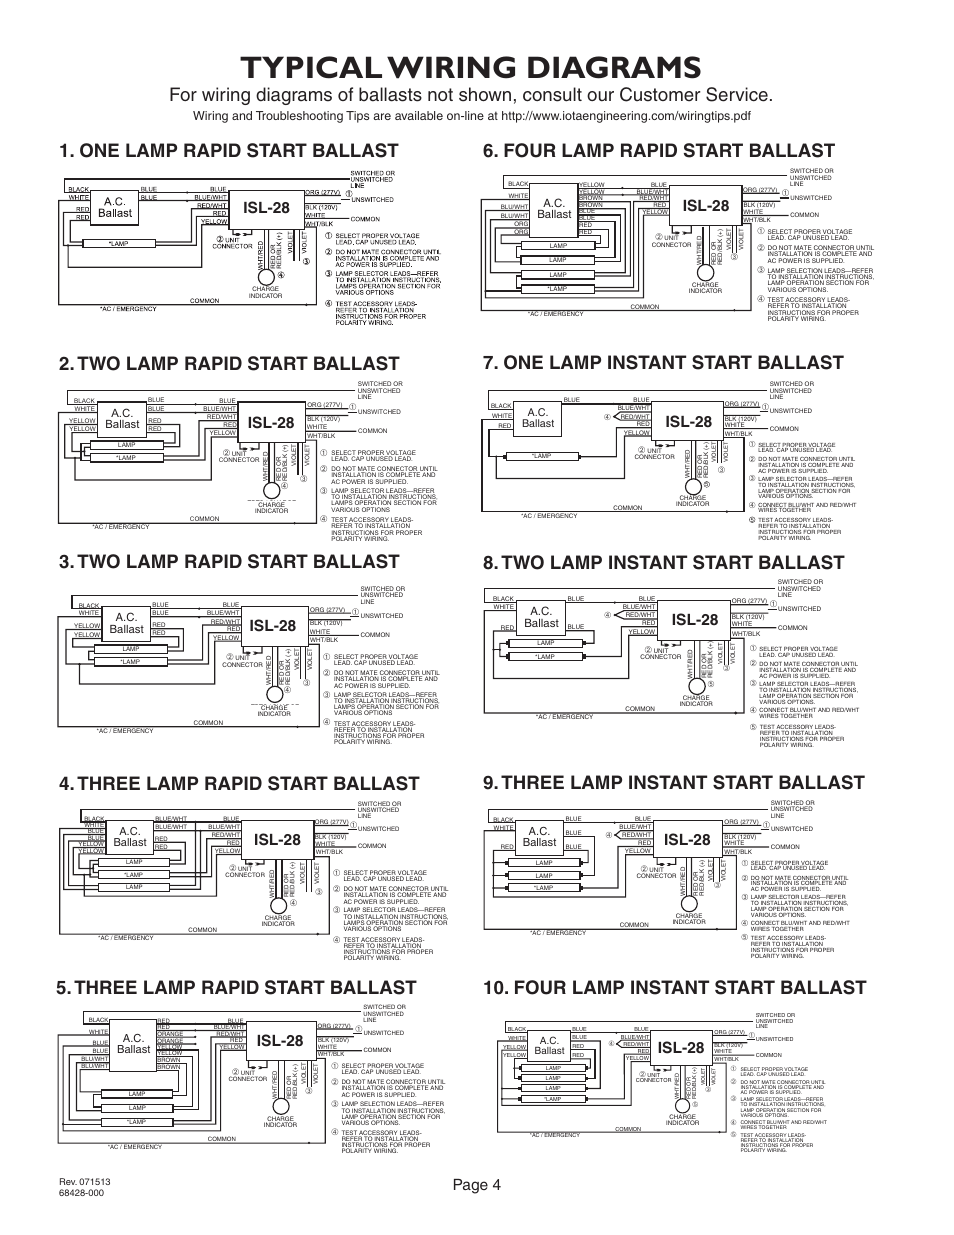 iota isl 28 page4?resize\\\\\\\\\\\\\\\\\\\\\\\\\\\\\\\=665%2C861 electric motors wiring schematic ks63bxmc 1820 craftsman,motors  at gsmx.co